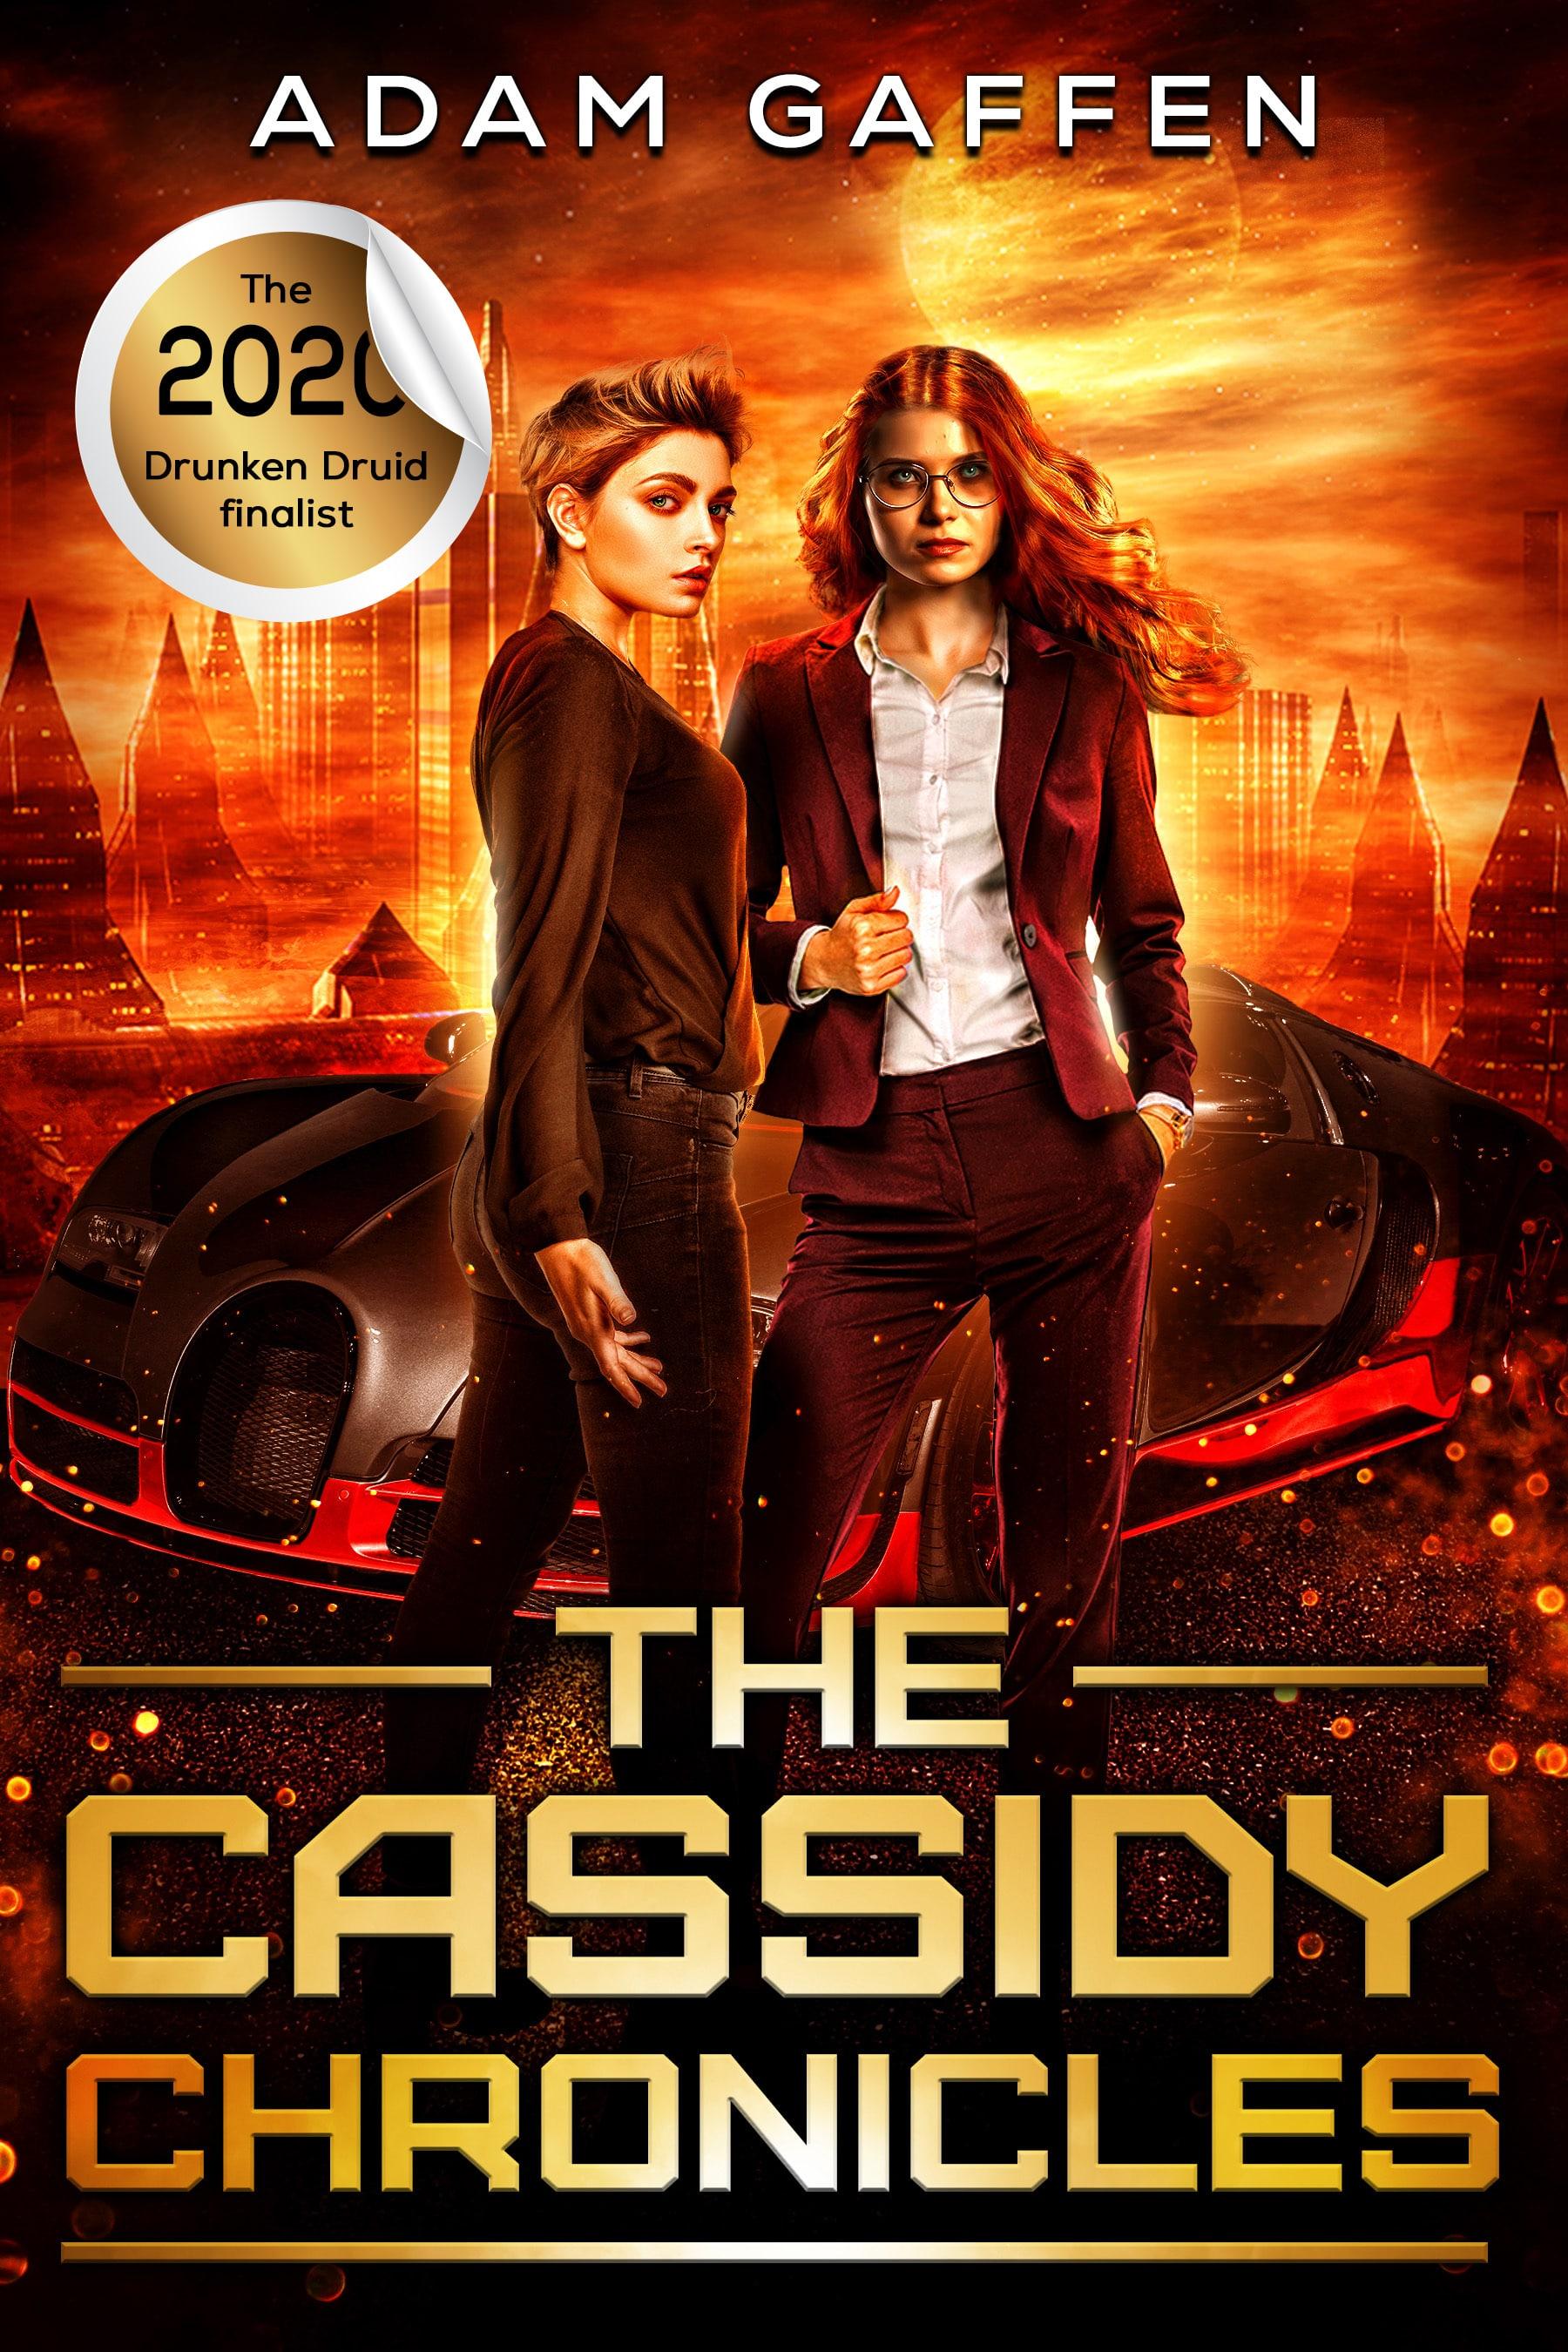 Cassidy Chronicles